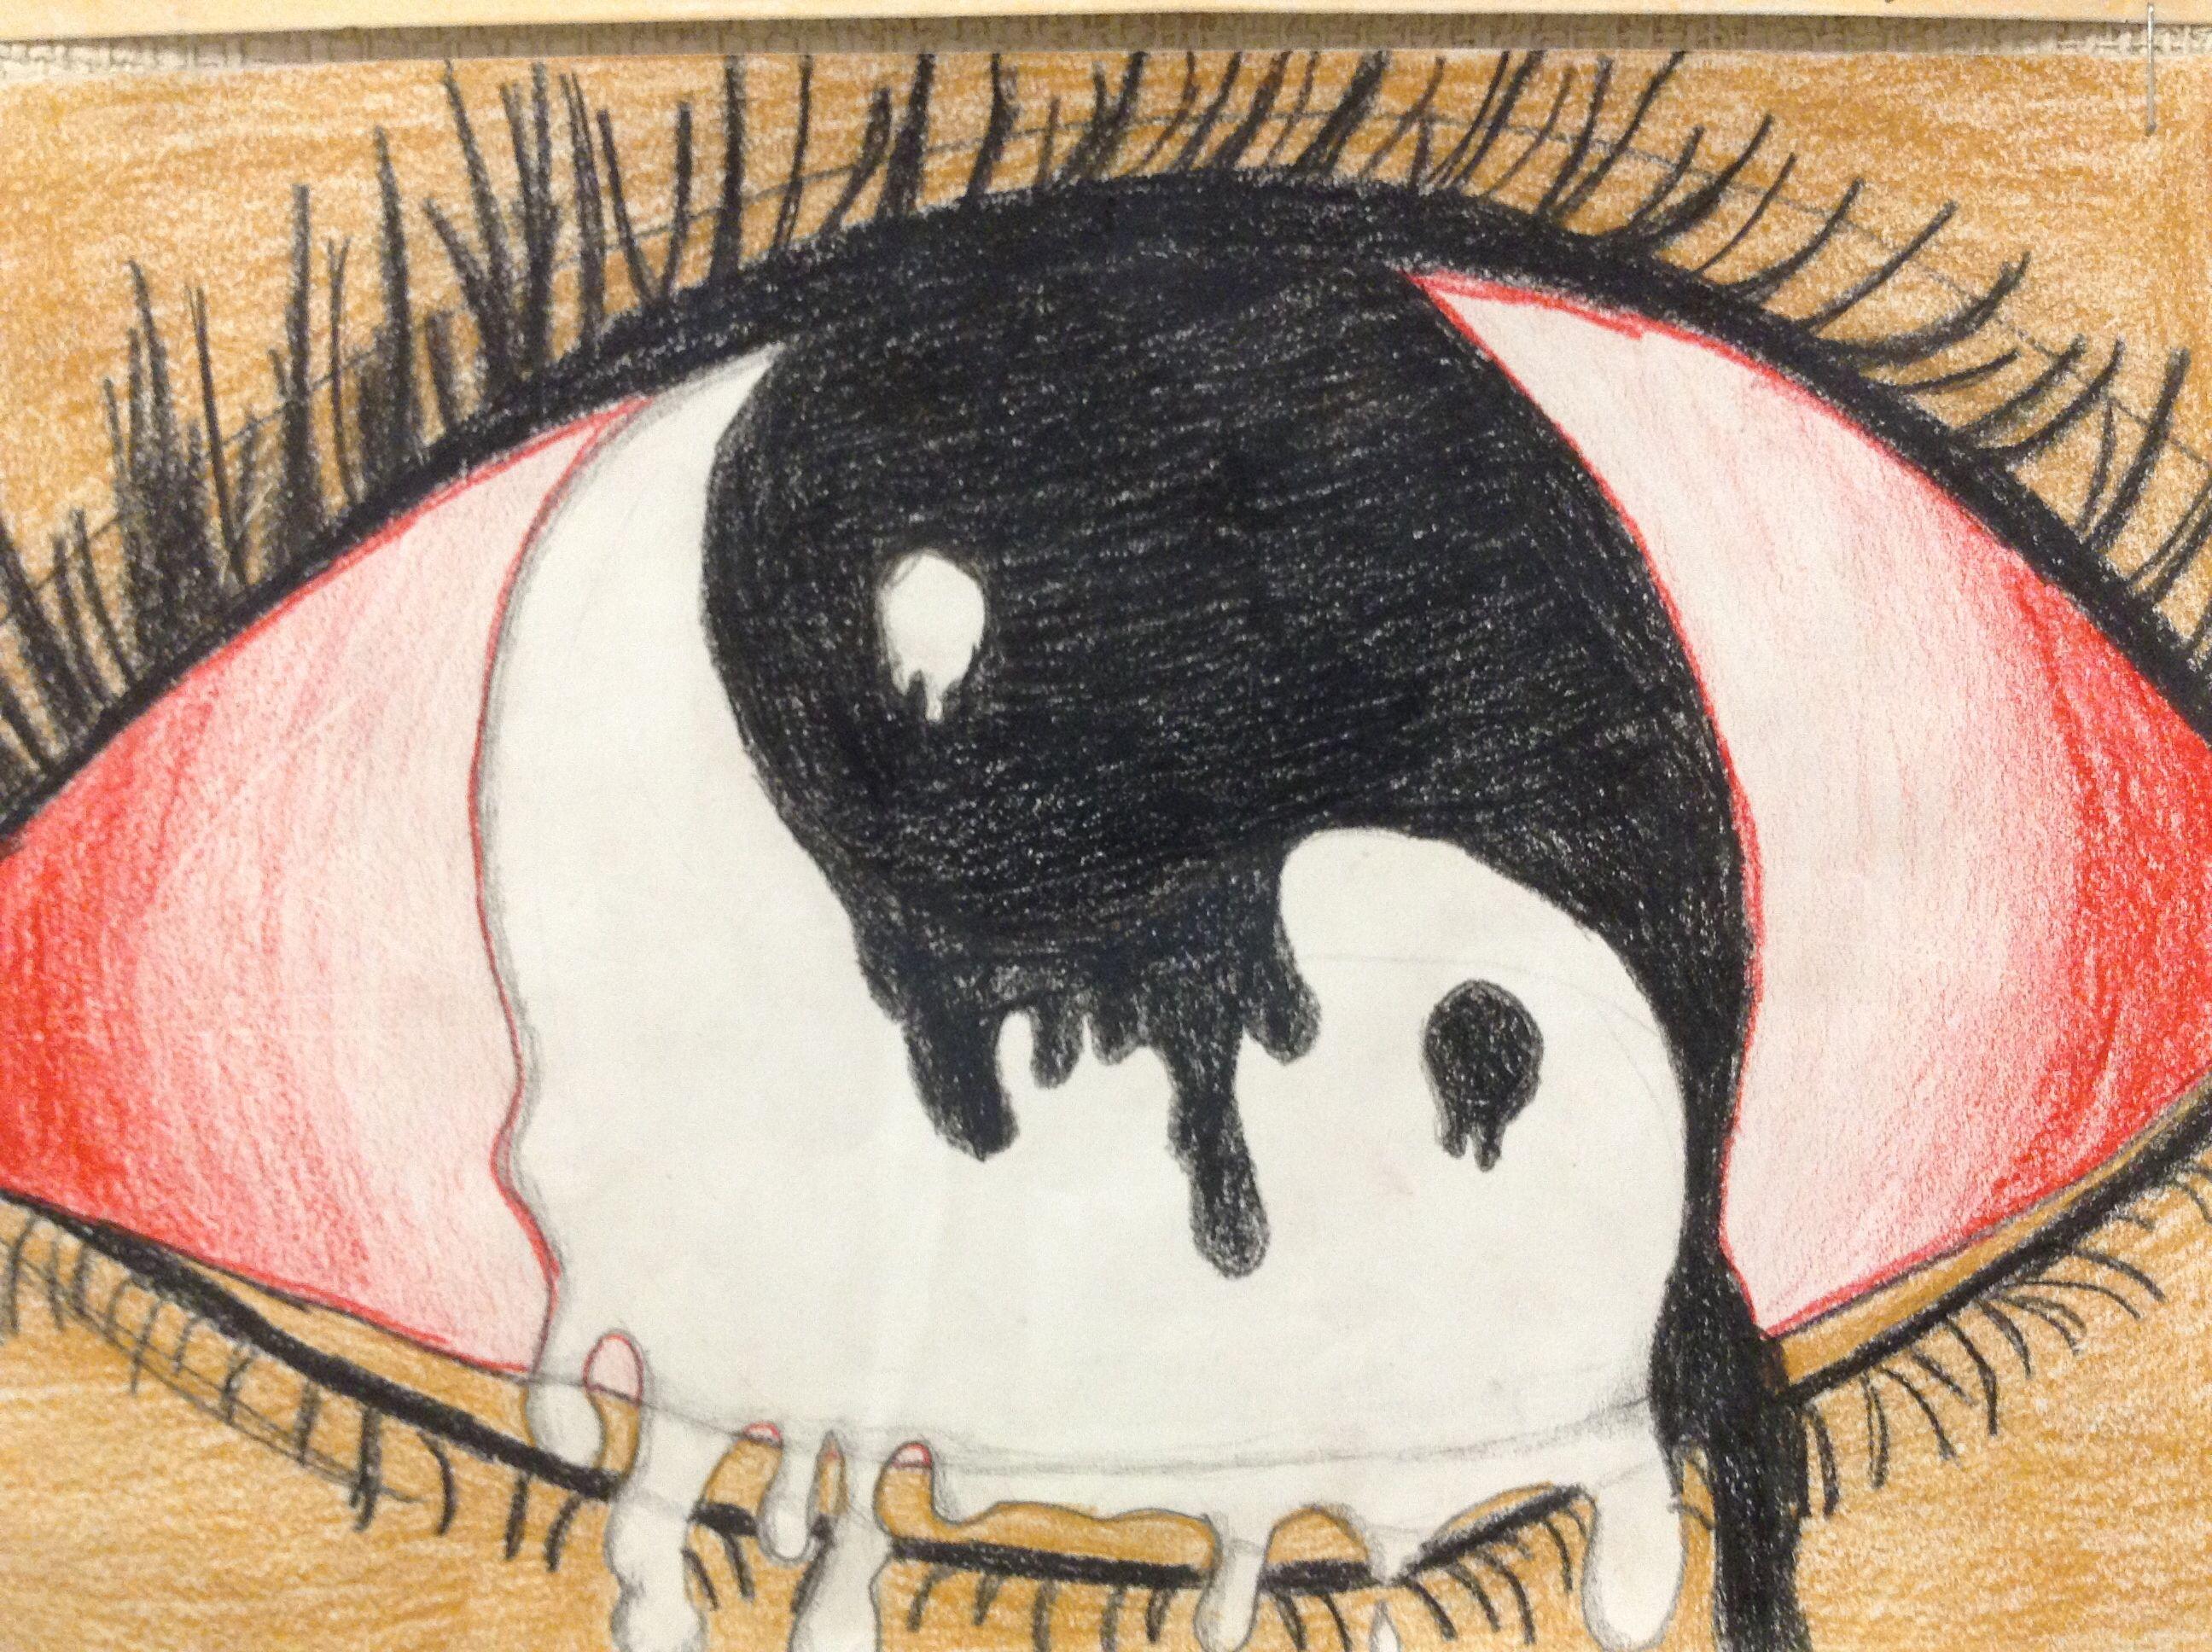 Artistic Surreal Eye Drawing